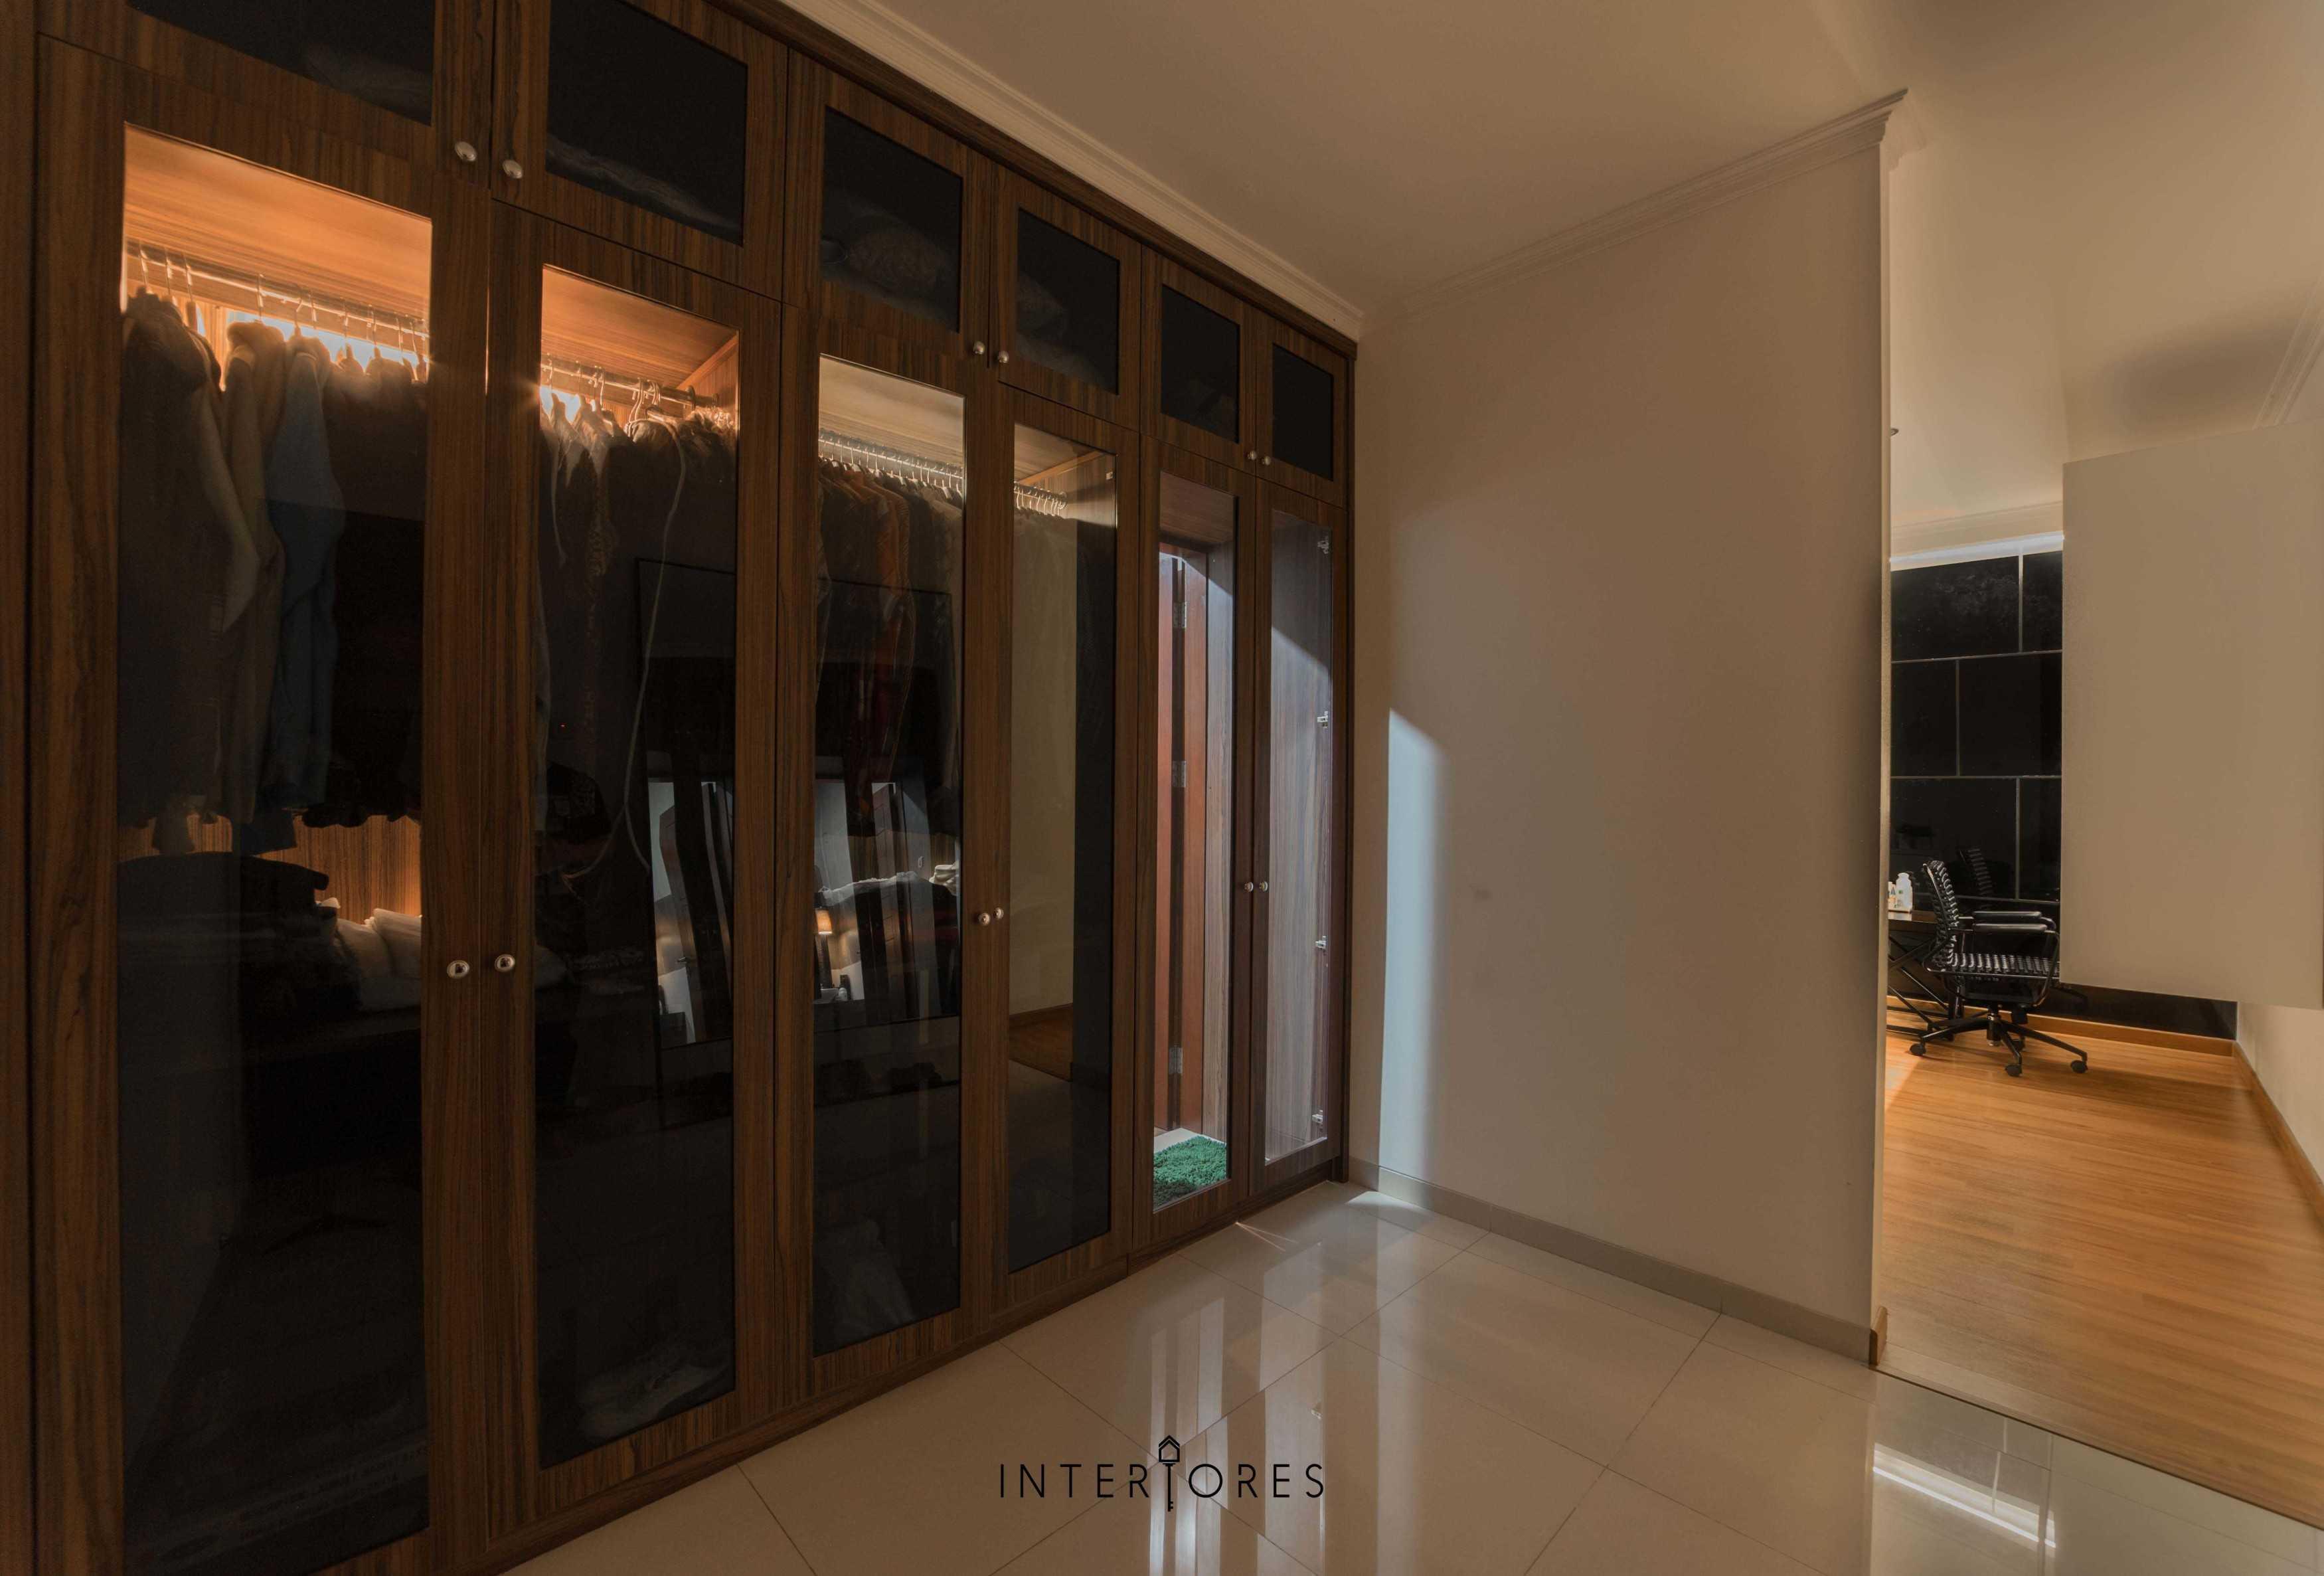 Interiores Interior Consultant & Build Greta 90 Bintaro Bintaro Closet Kontemporer  17673